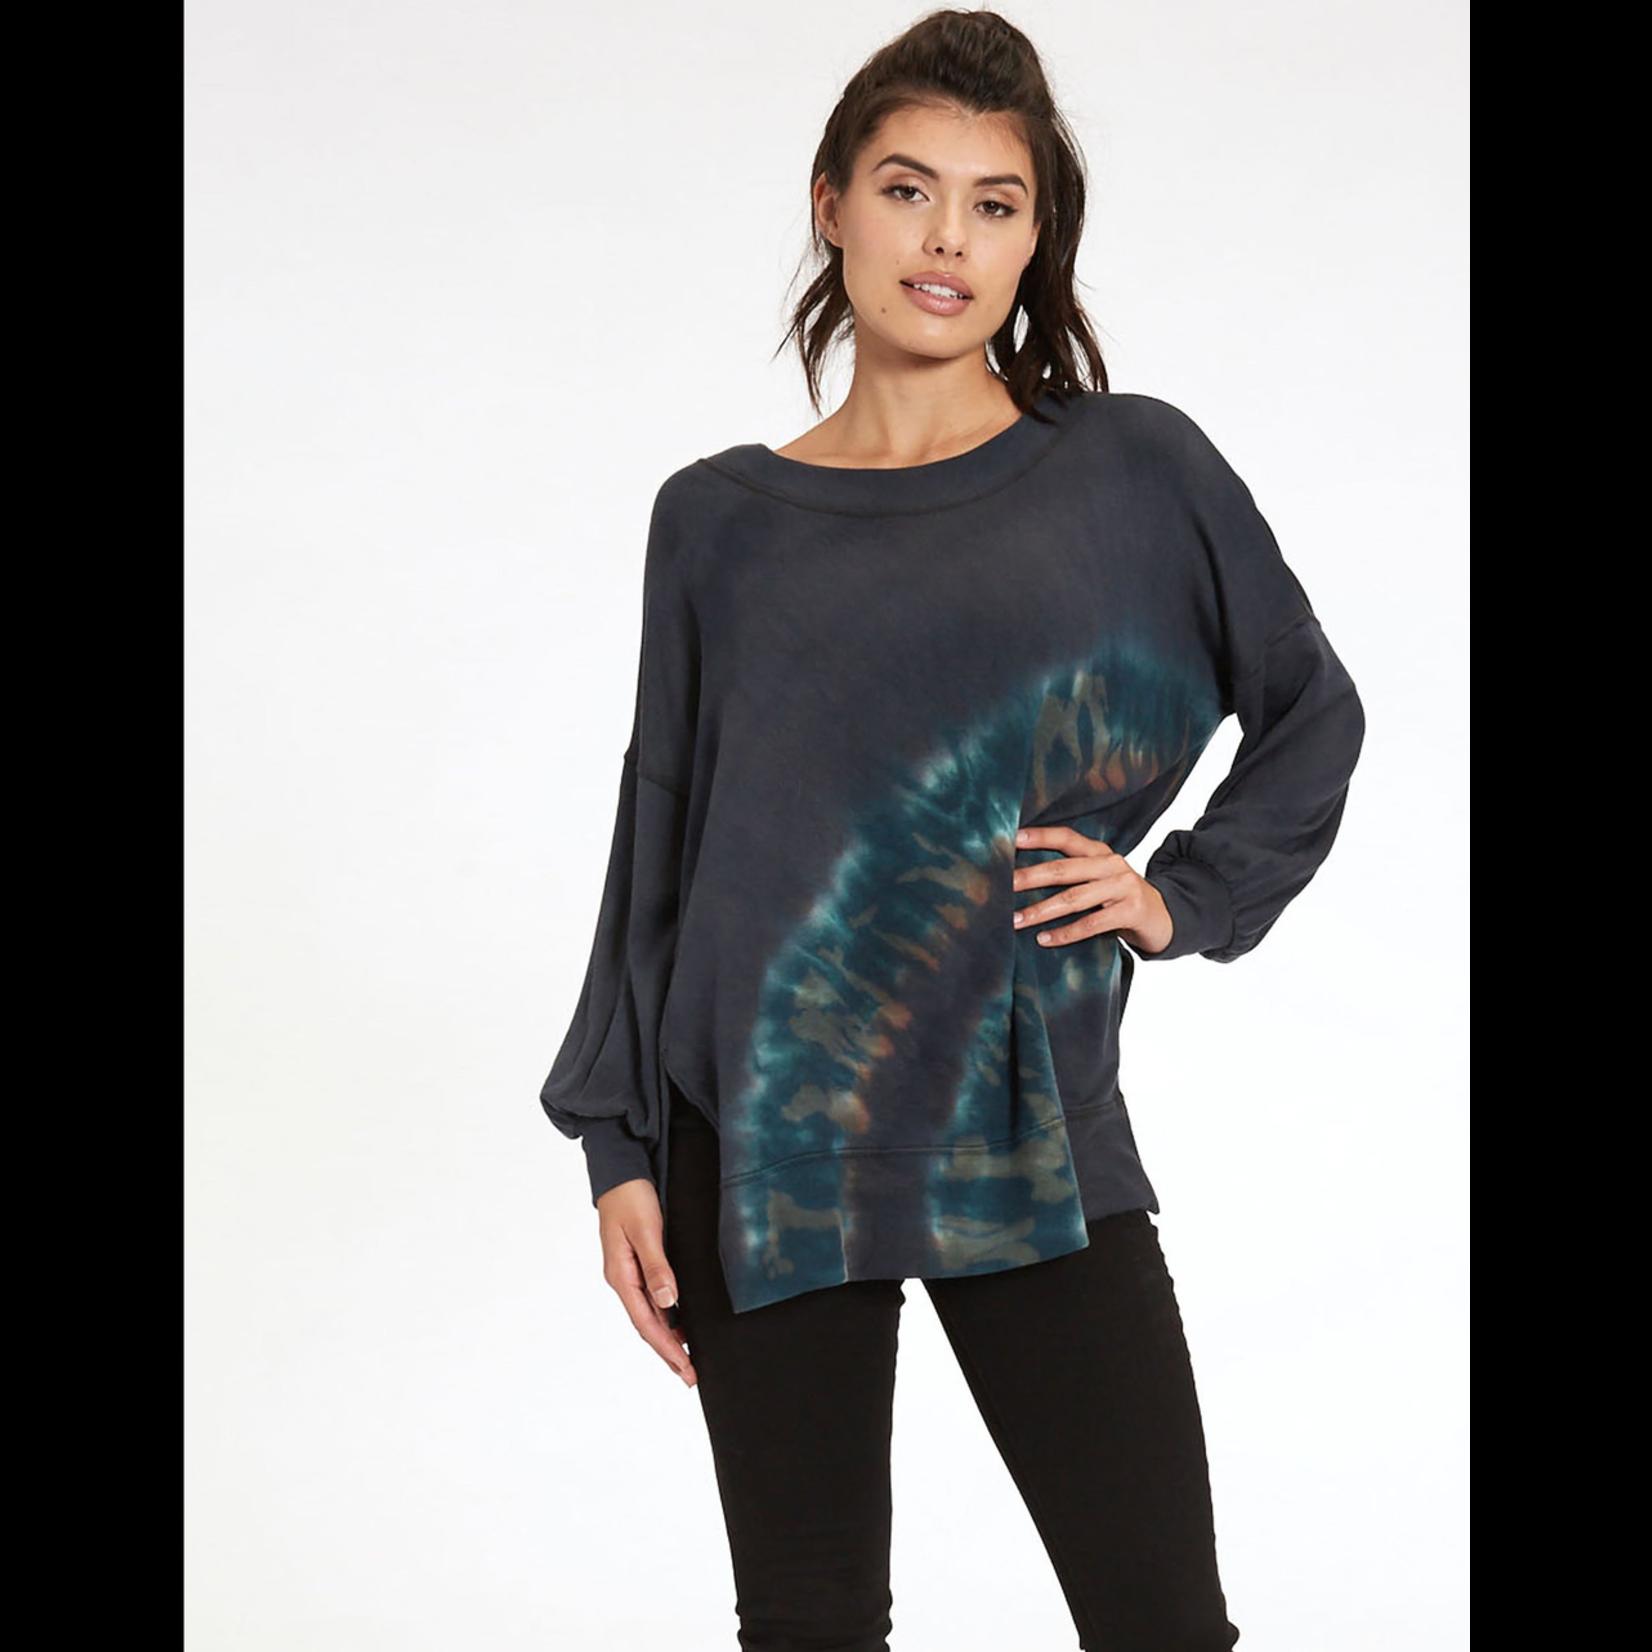 Chilled Sweatshirt in Peacock